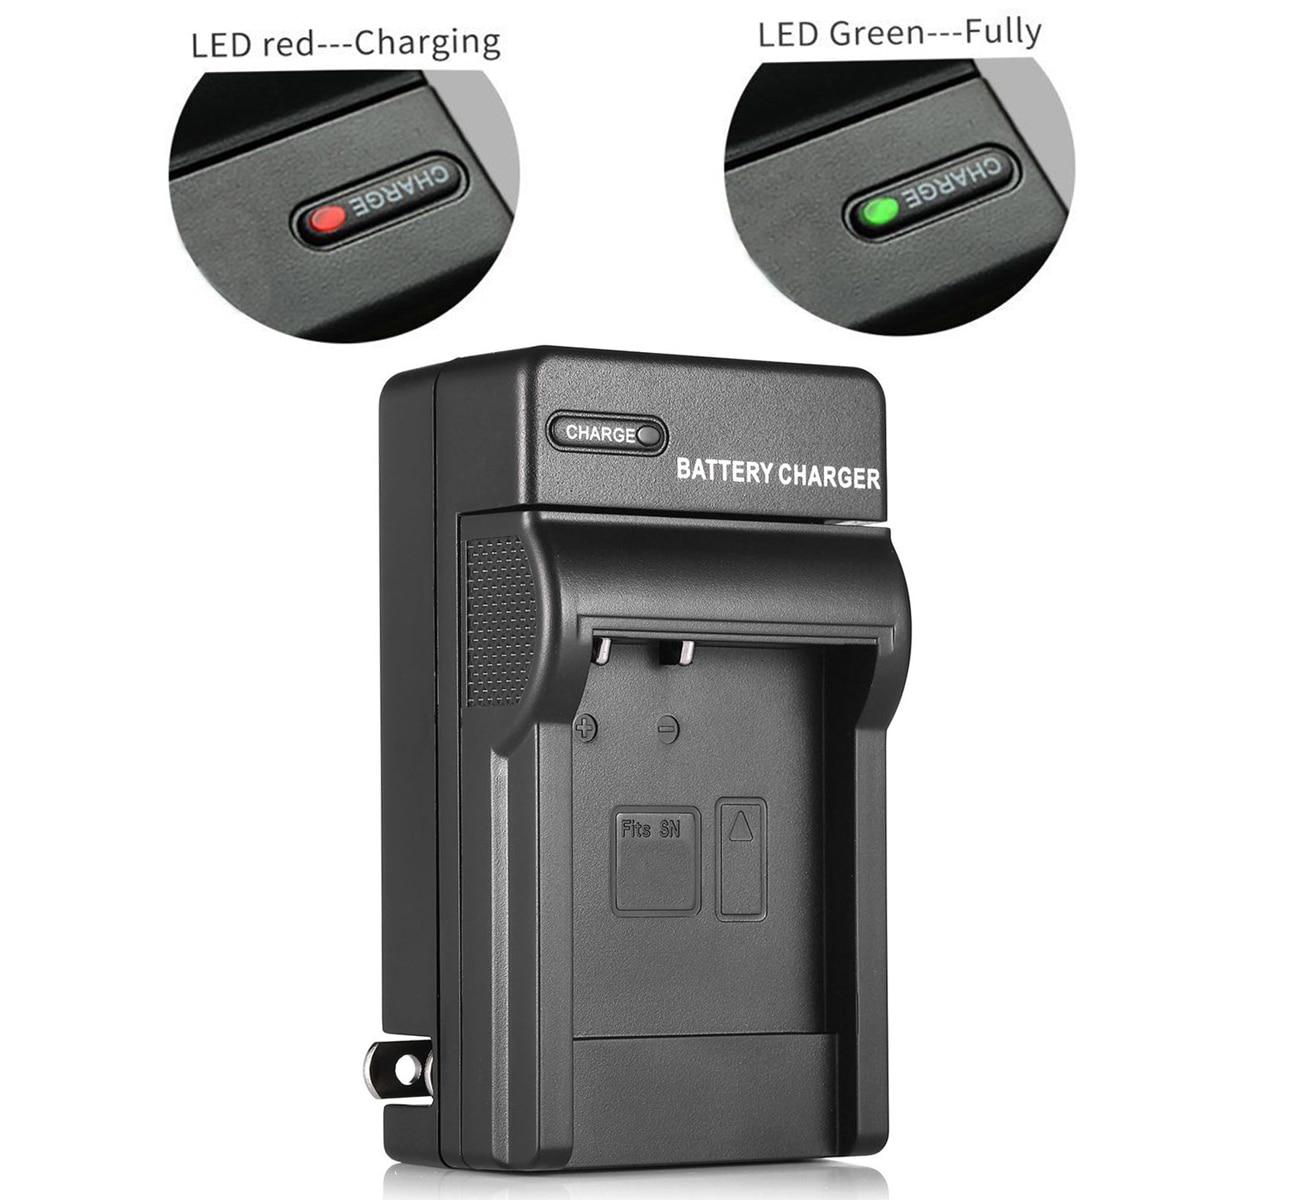 GZ-HD520BU Micro USB Battery Charger for JVC Everio GZ-HD500BU GZ-HD620BU HD Hard Drive Camcorder